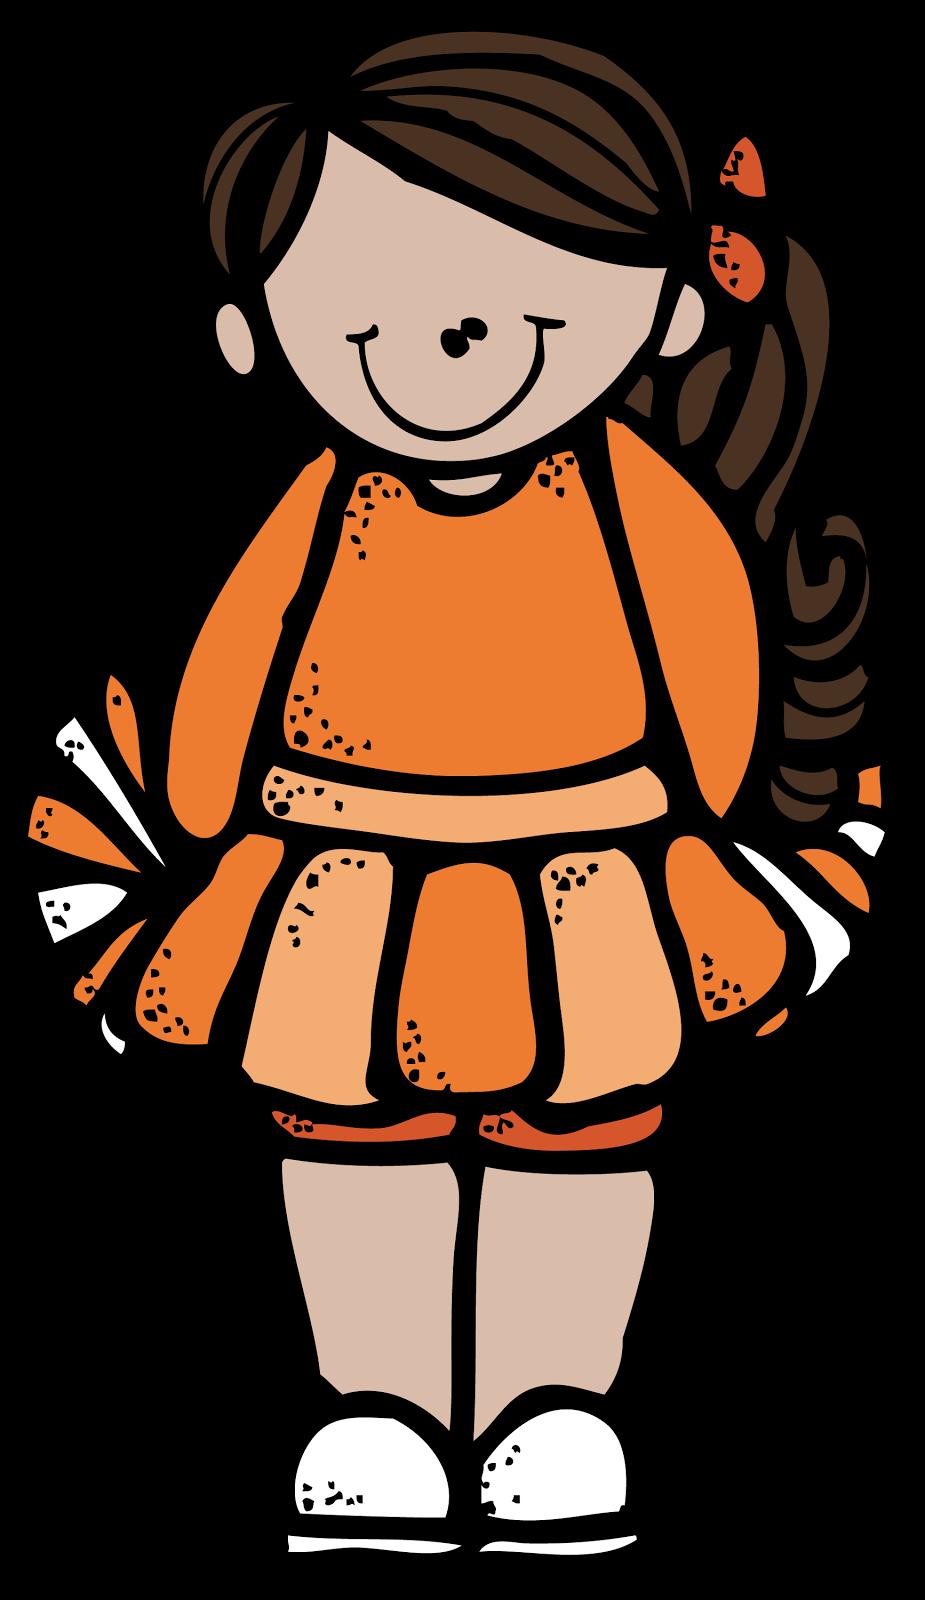 Melonheadz colored png melonheads. Clipart kids cheerleader